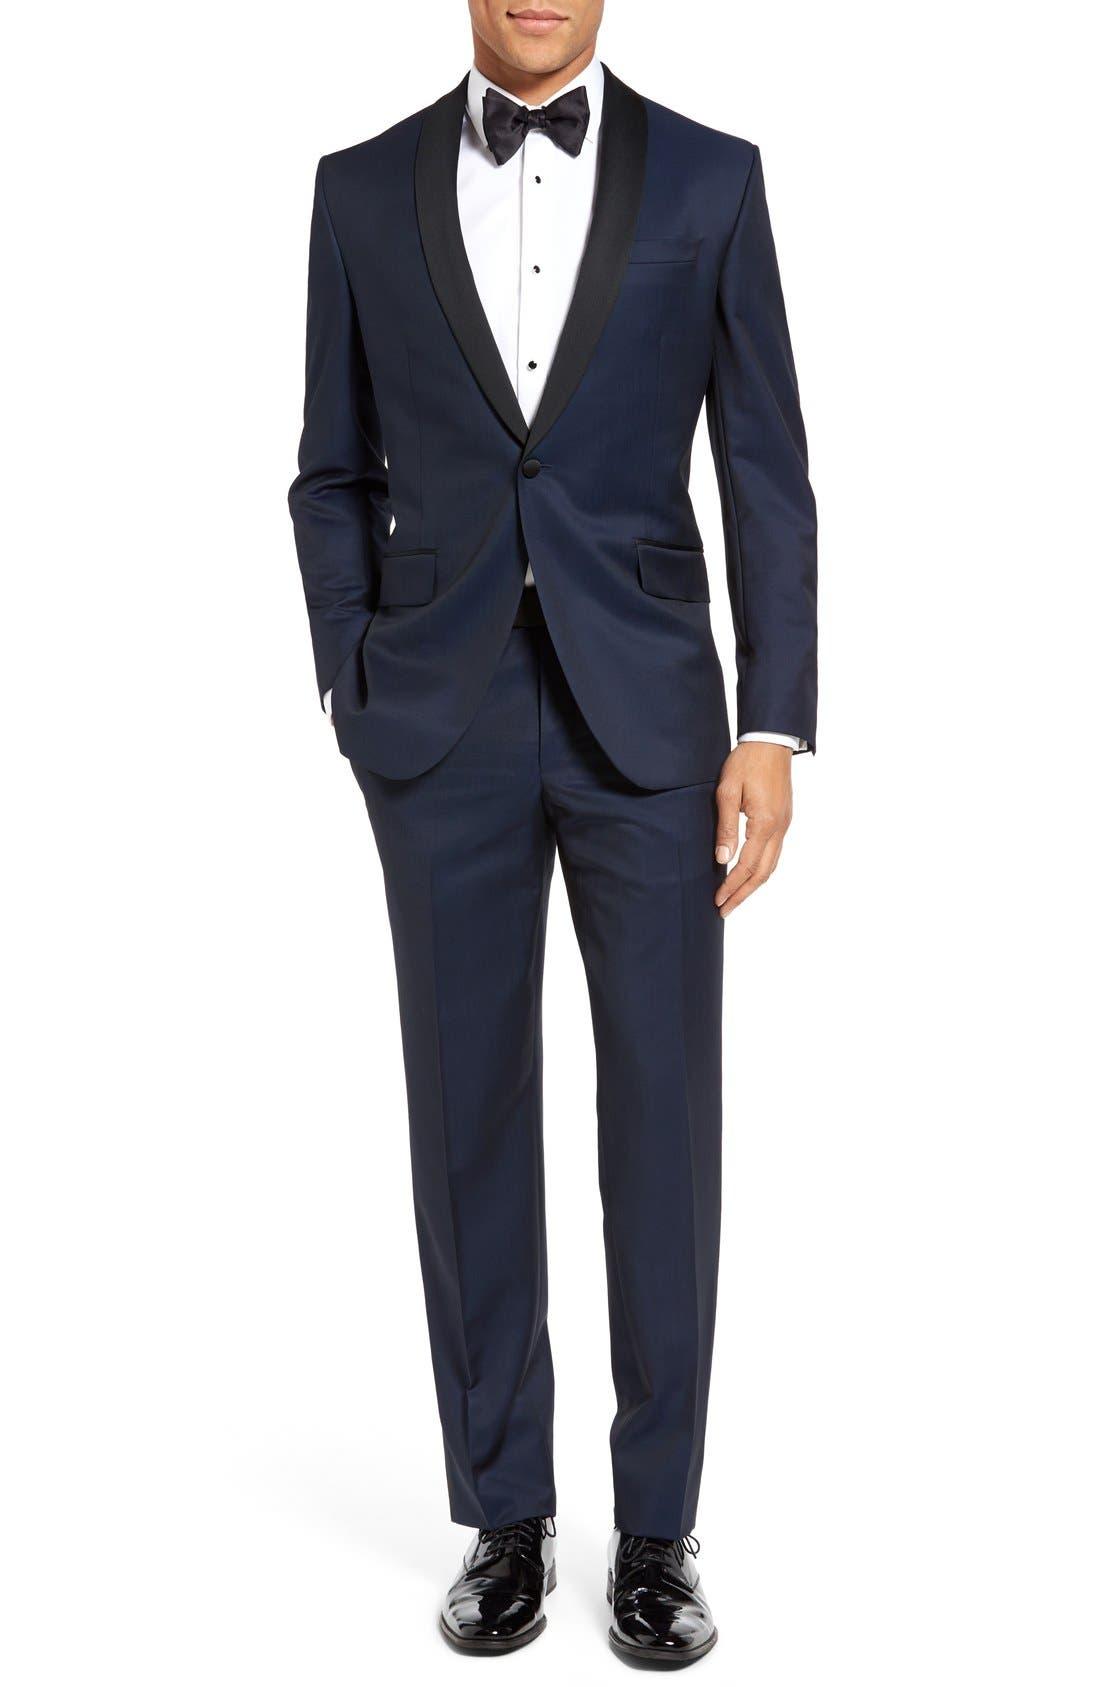 'Josh' Trim Fit Navy Shawl Lapel Tuxedo,                         Main,                         color, Navy Blue